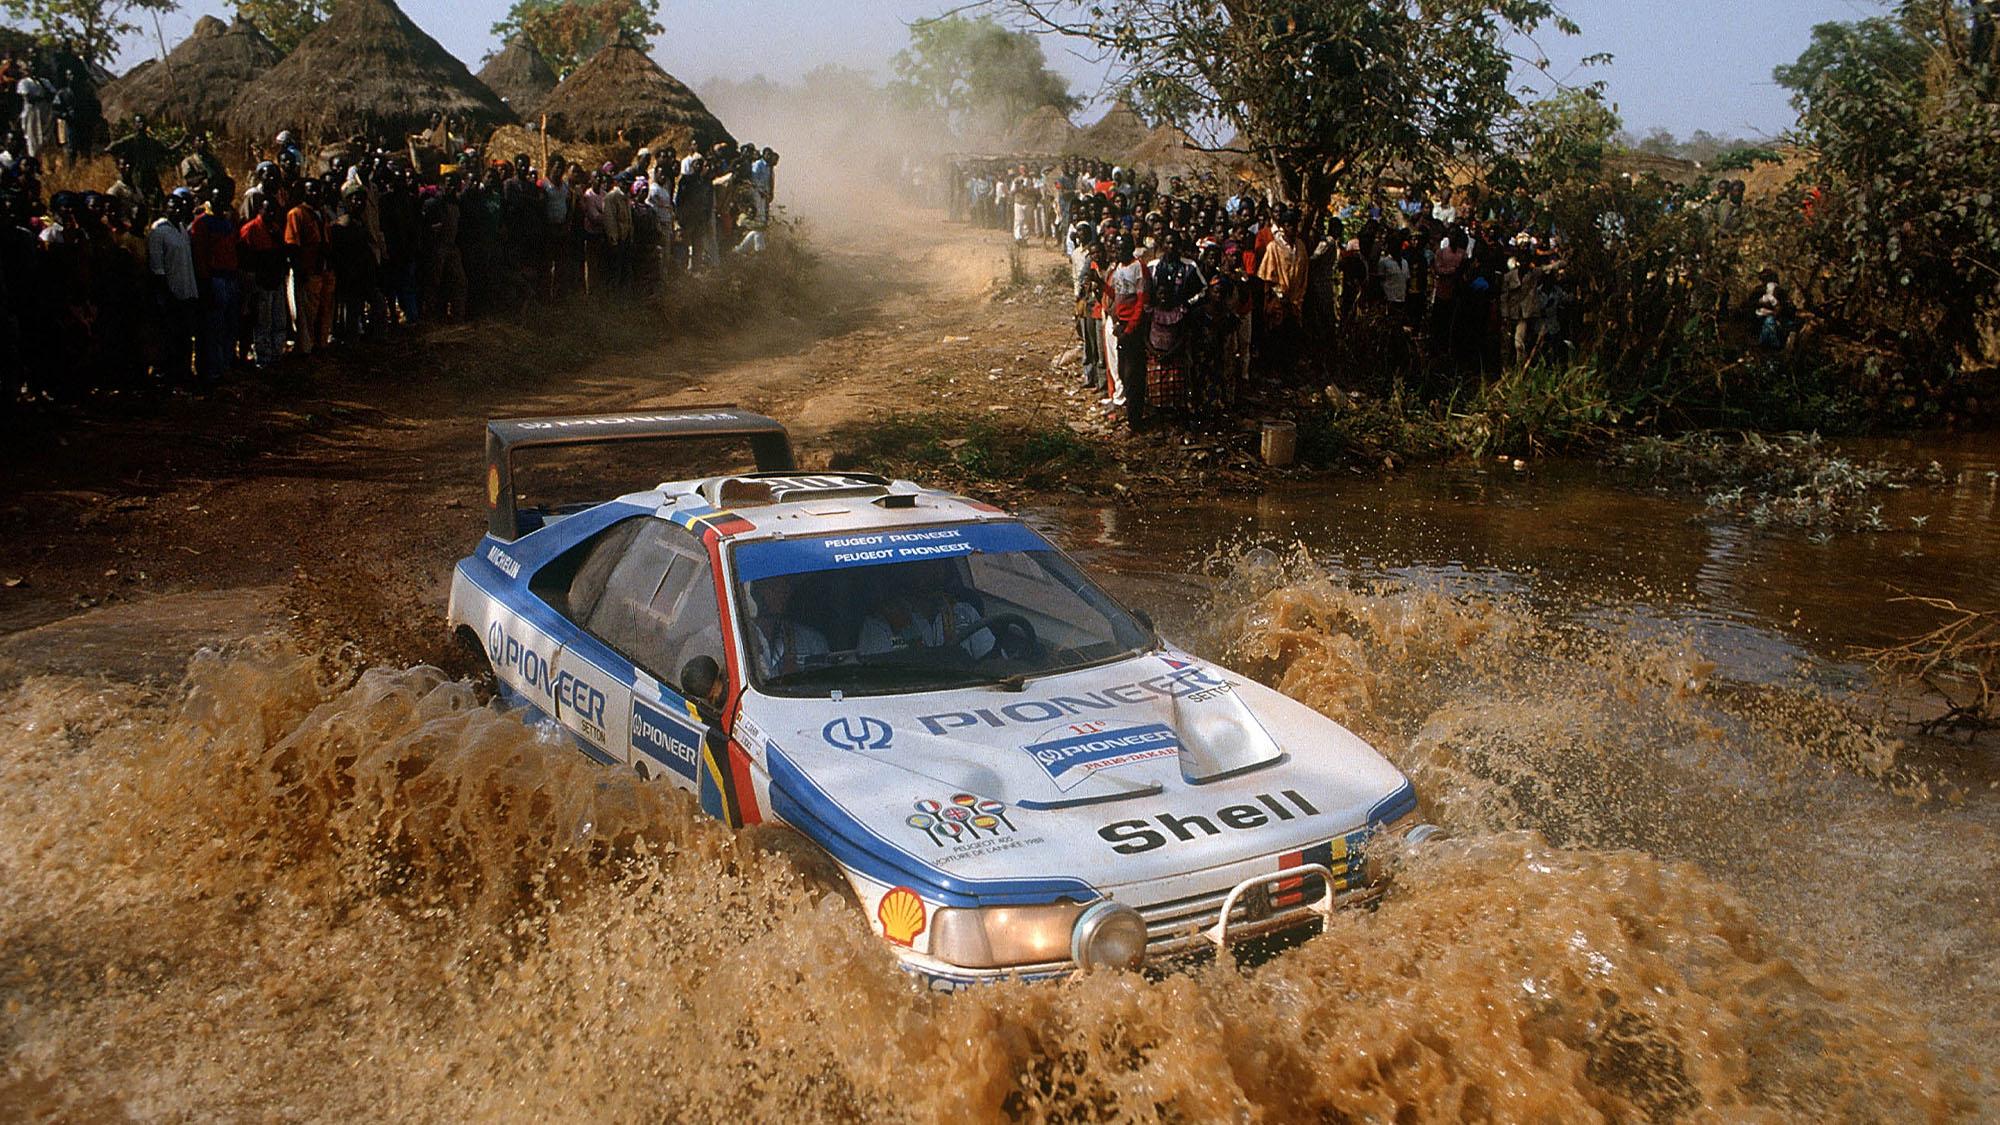 Ickx Dakar 1989